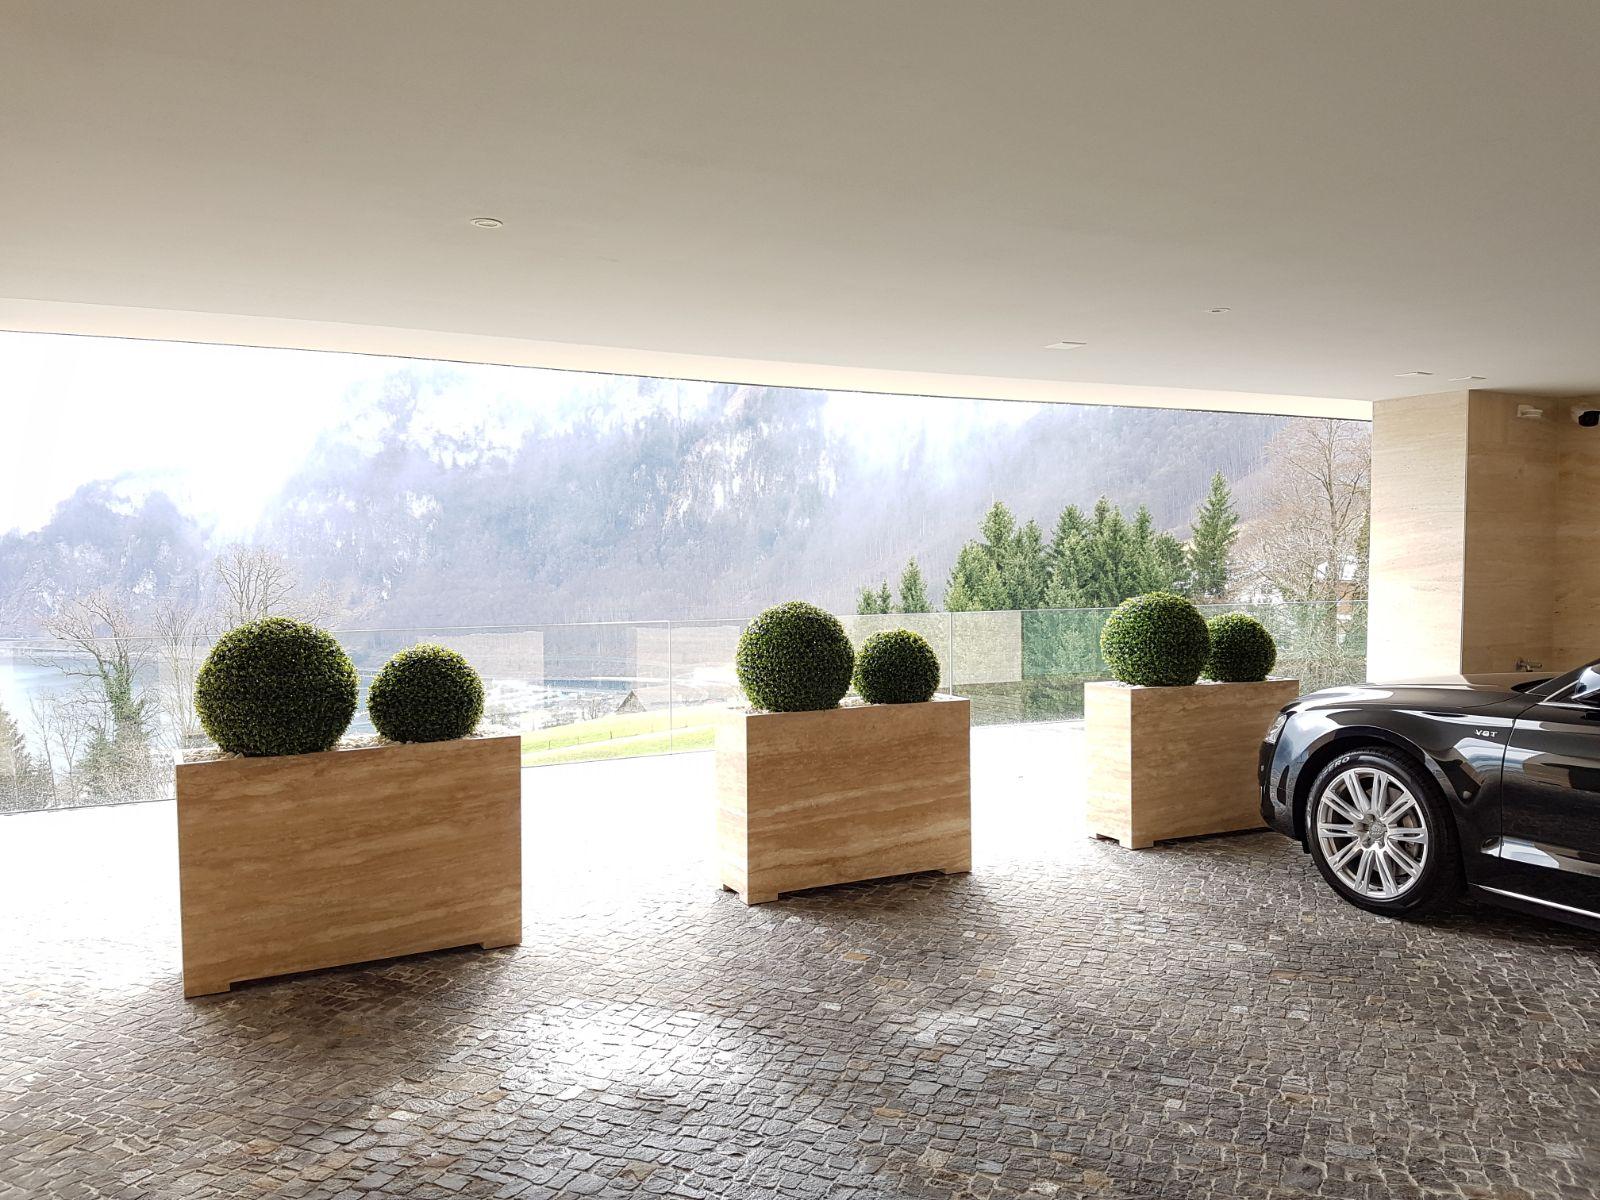 wetterfeste buchskugeln premium kunstpflanzen dekohaus ag. Black Bedroom Furniture Sets. Home Design Ideas